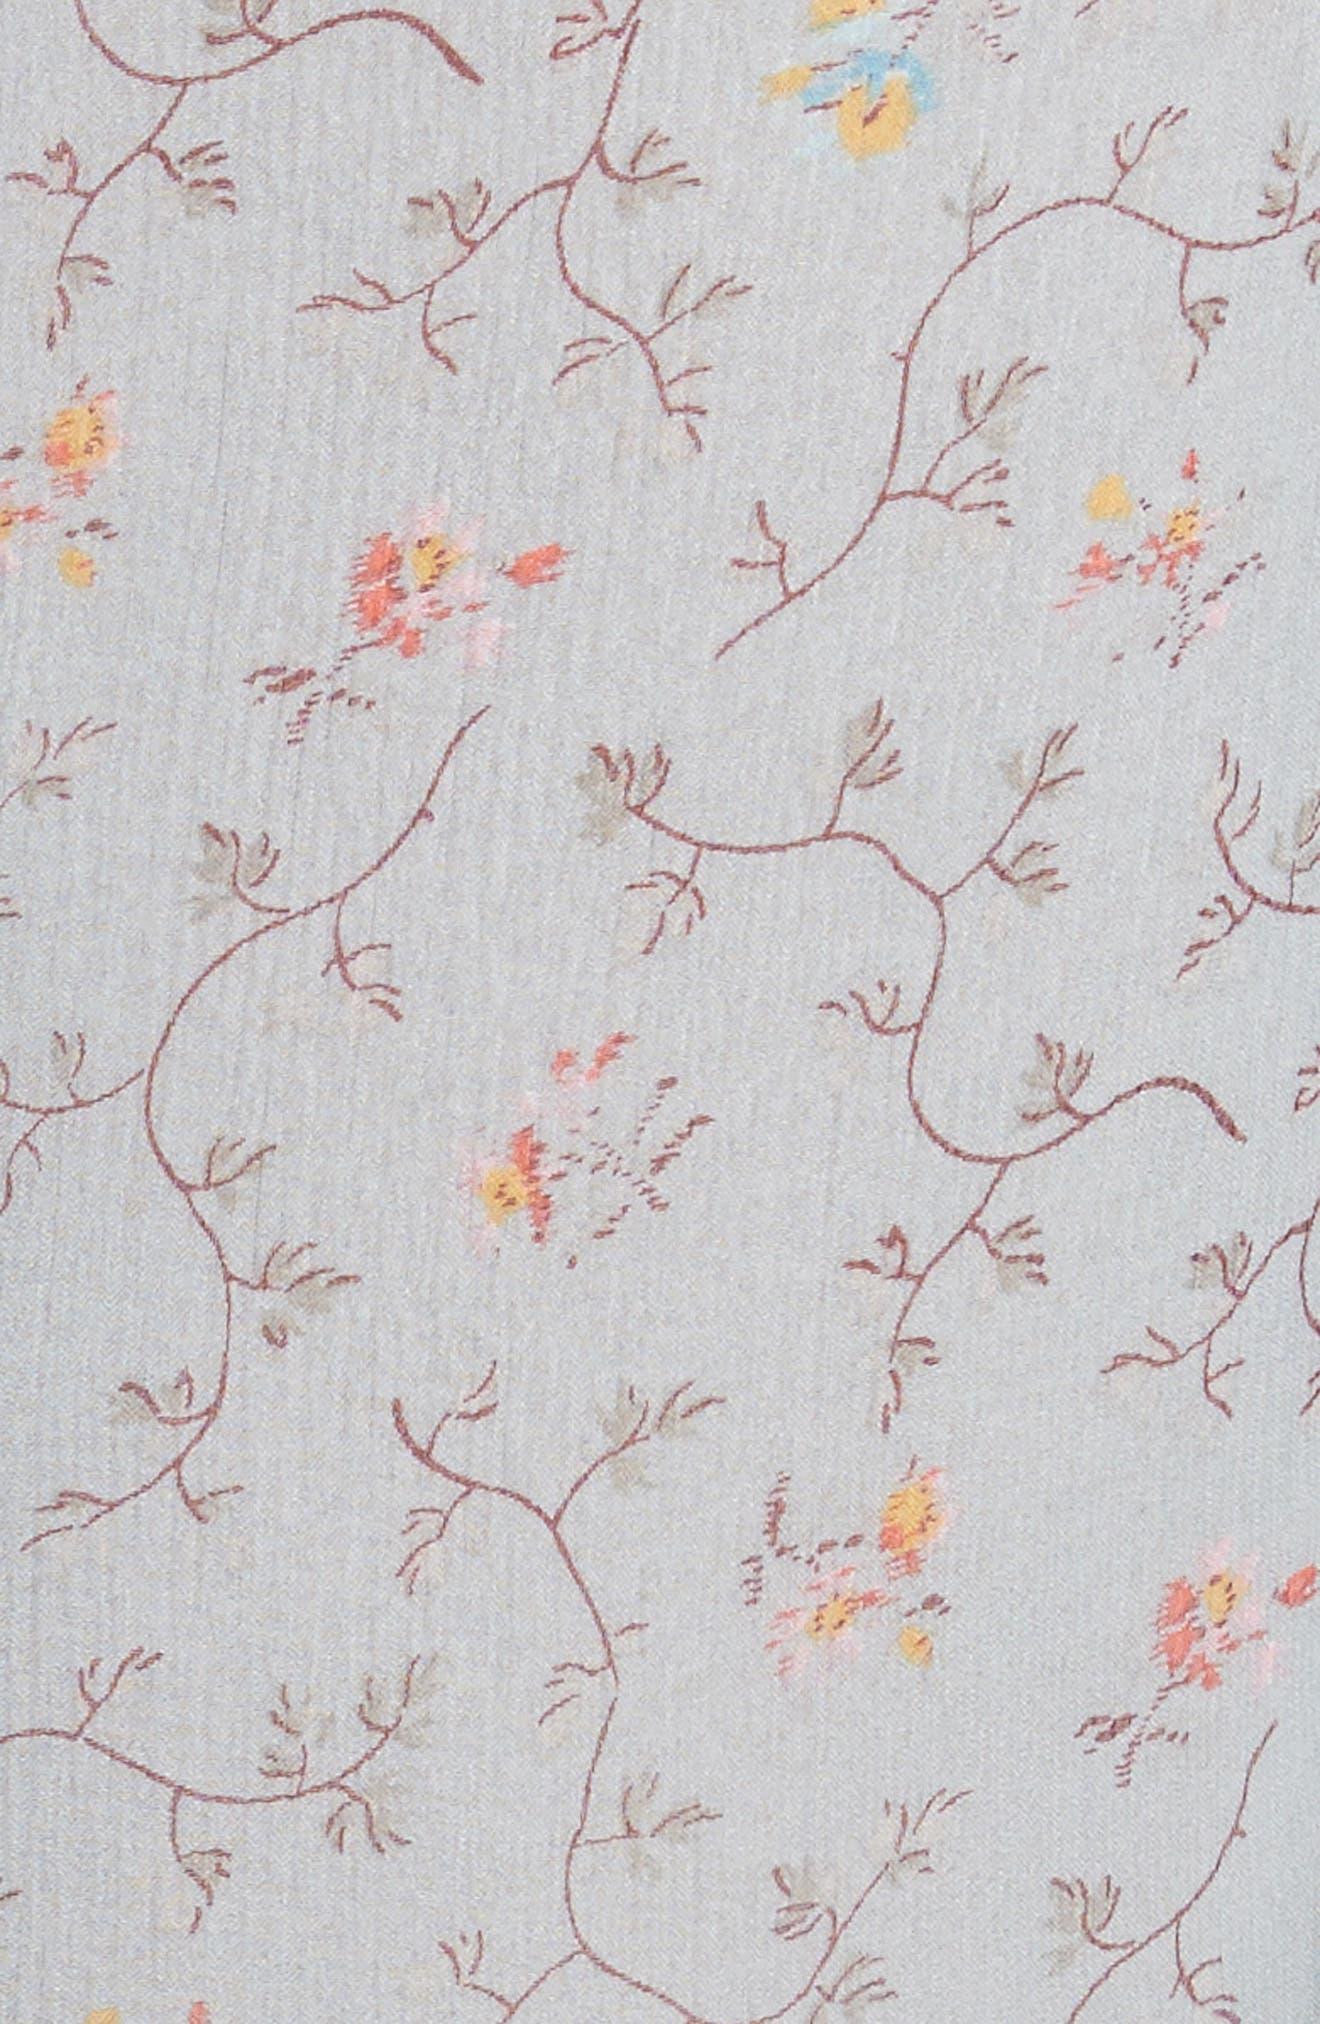 Floral Vine Ruffle Silk Dress,                             Alternate thumbnail 5, color,                             400